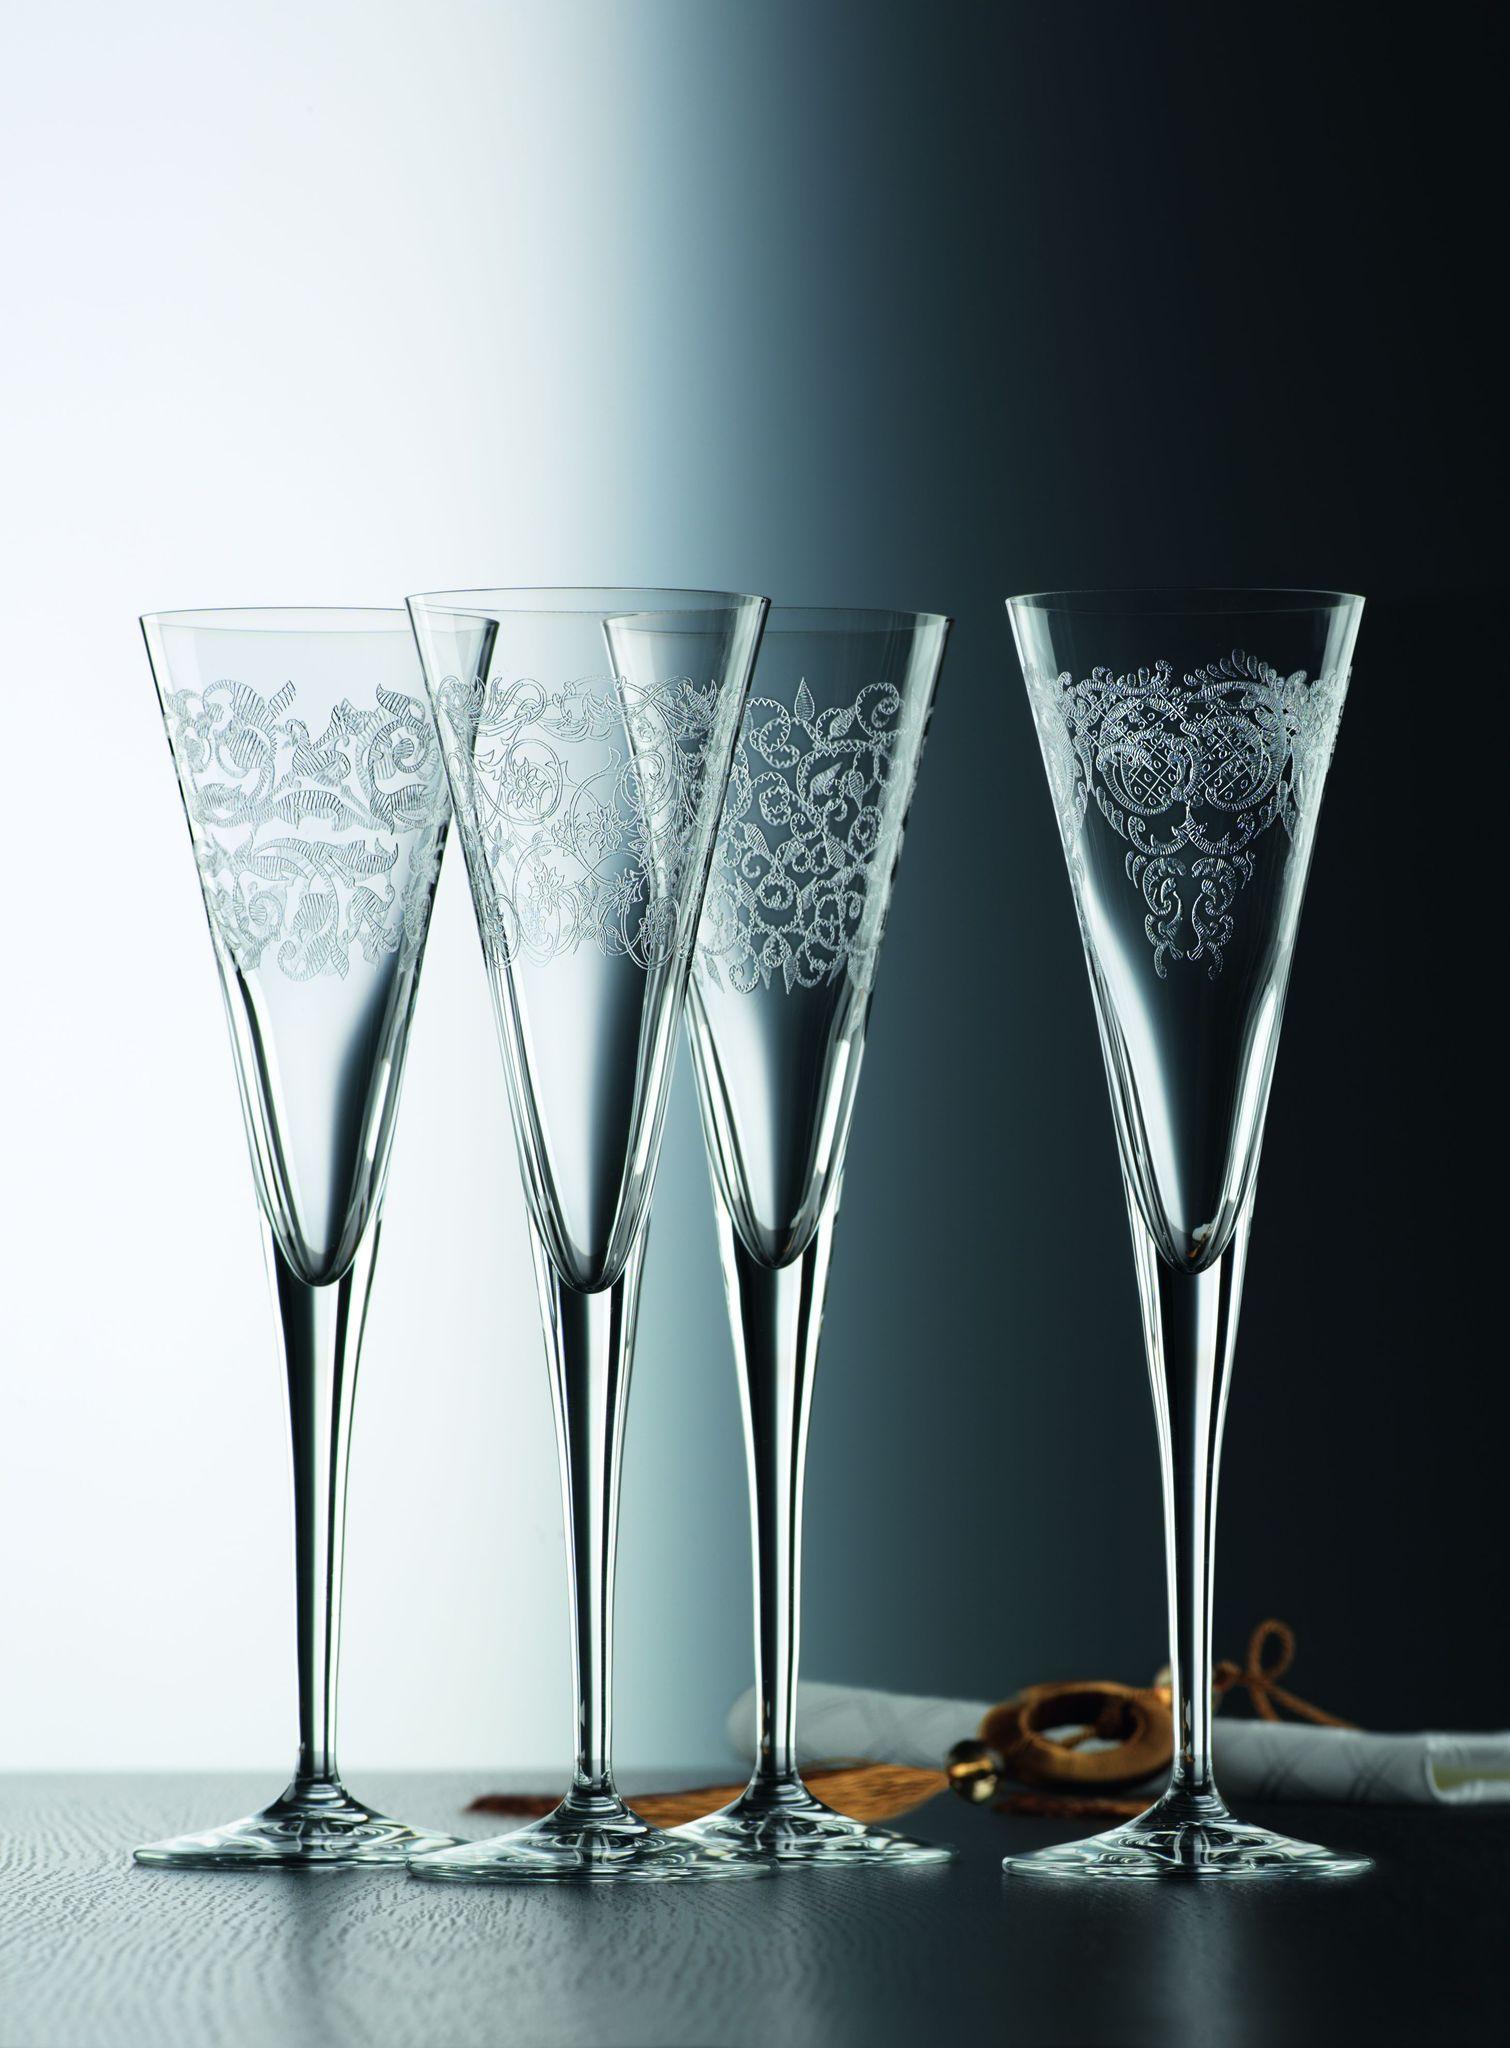 Бокалы Набор бокалов для шампанского 4шт 165мл Nachtmann Delight nabor-bokalov-dlya-shampanskogo-4sht-165ml-nachtmann-delight-germaniya.jpg